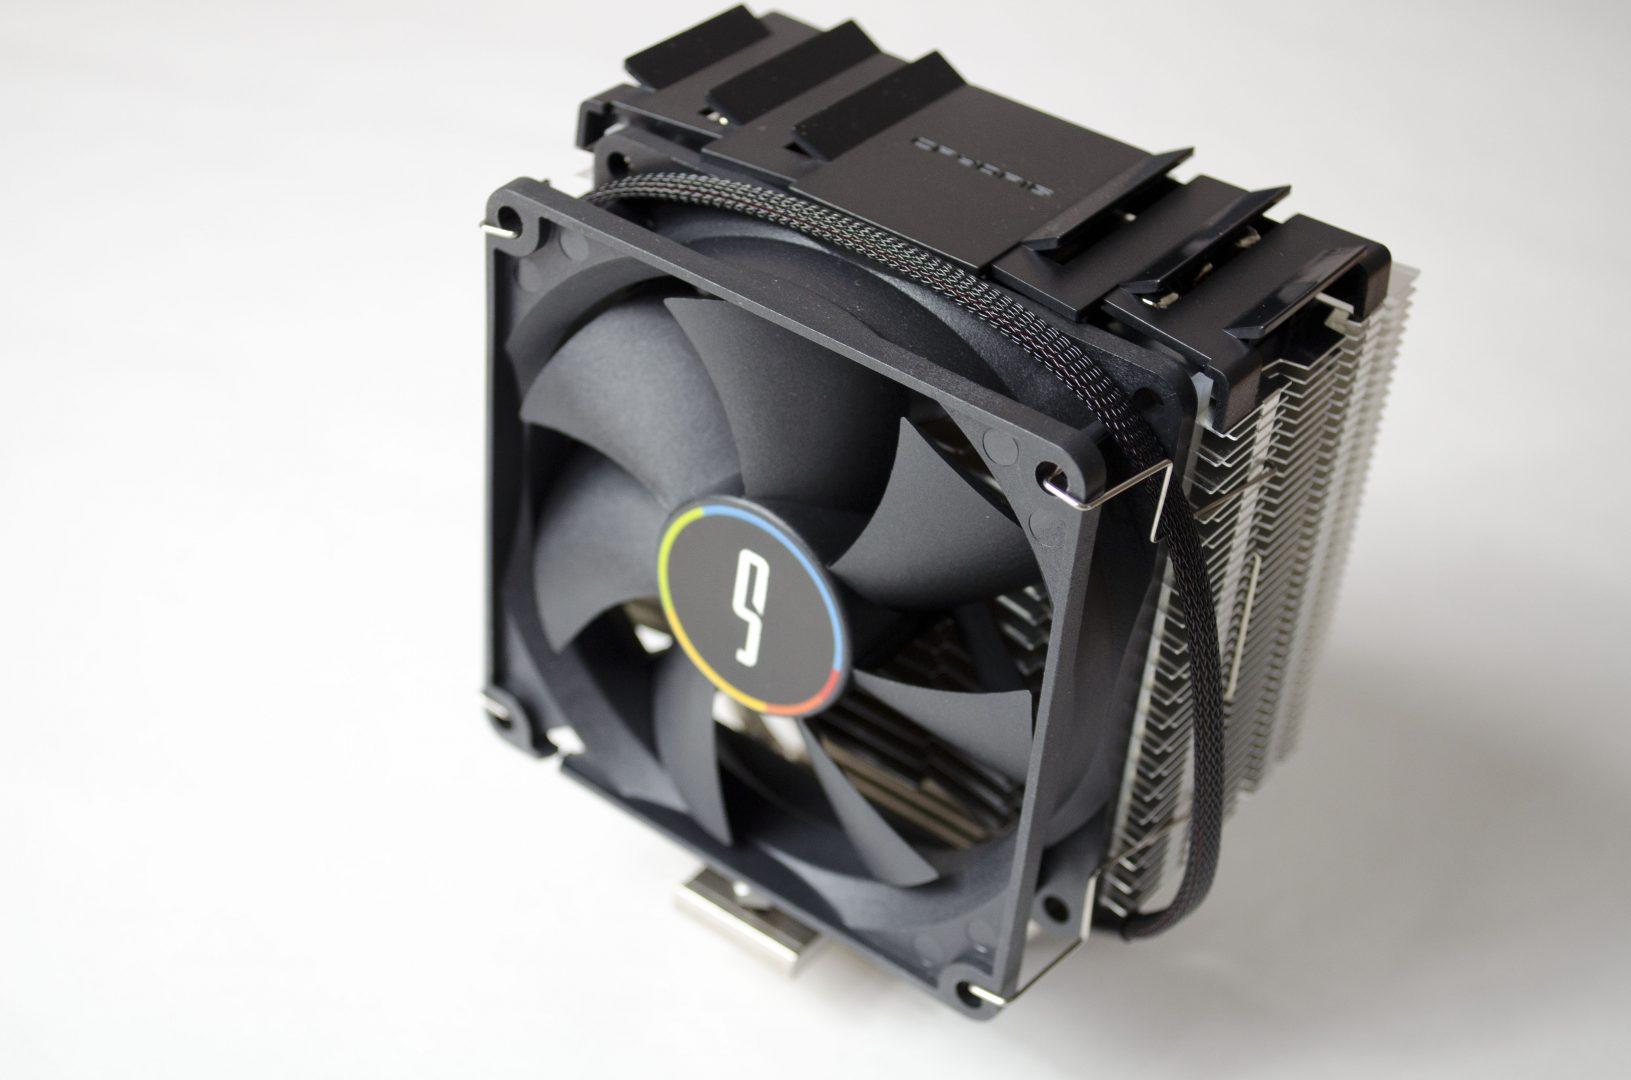 cryorig m9i cpu cooler review_2